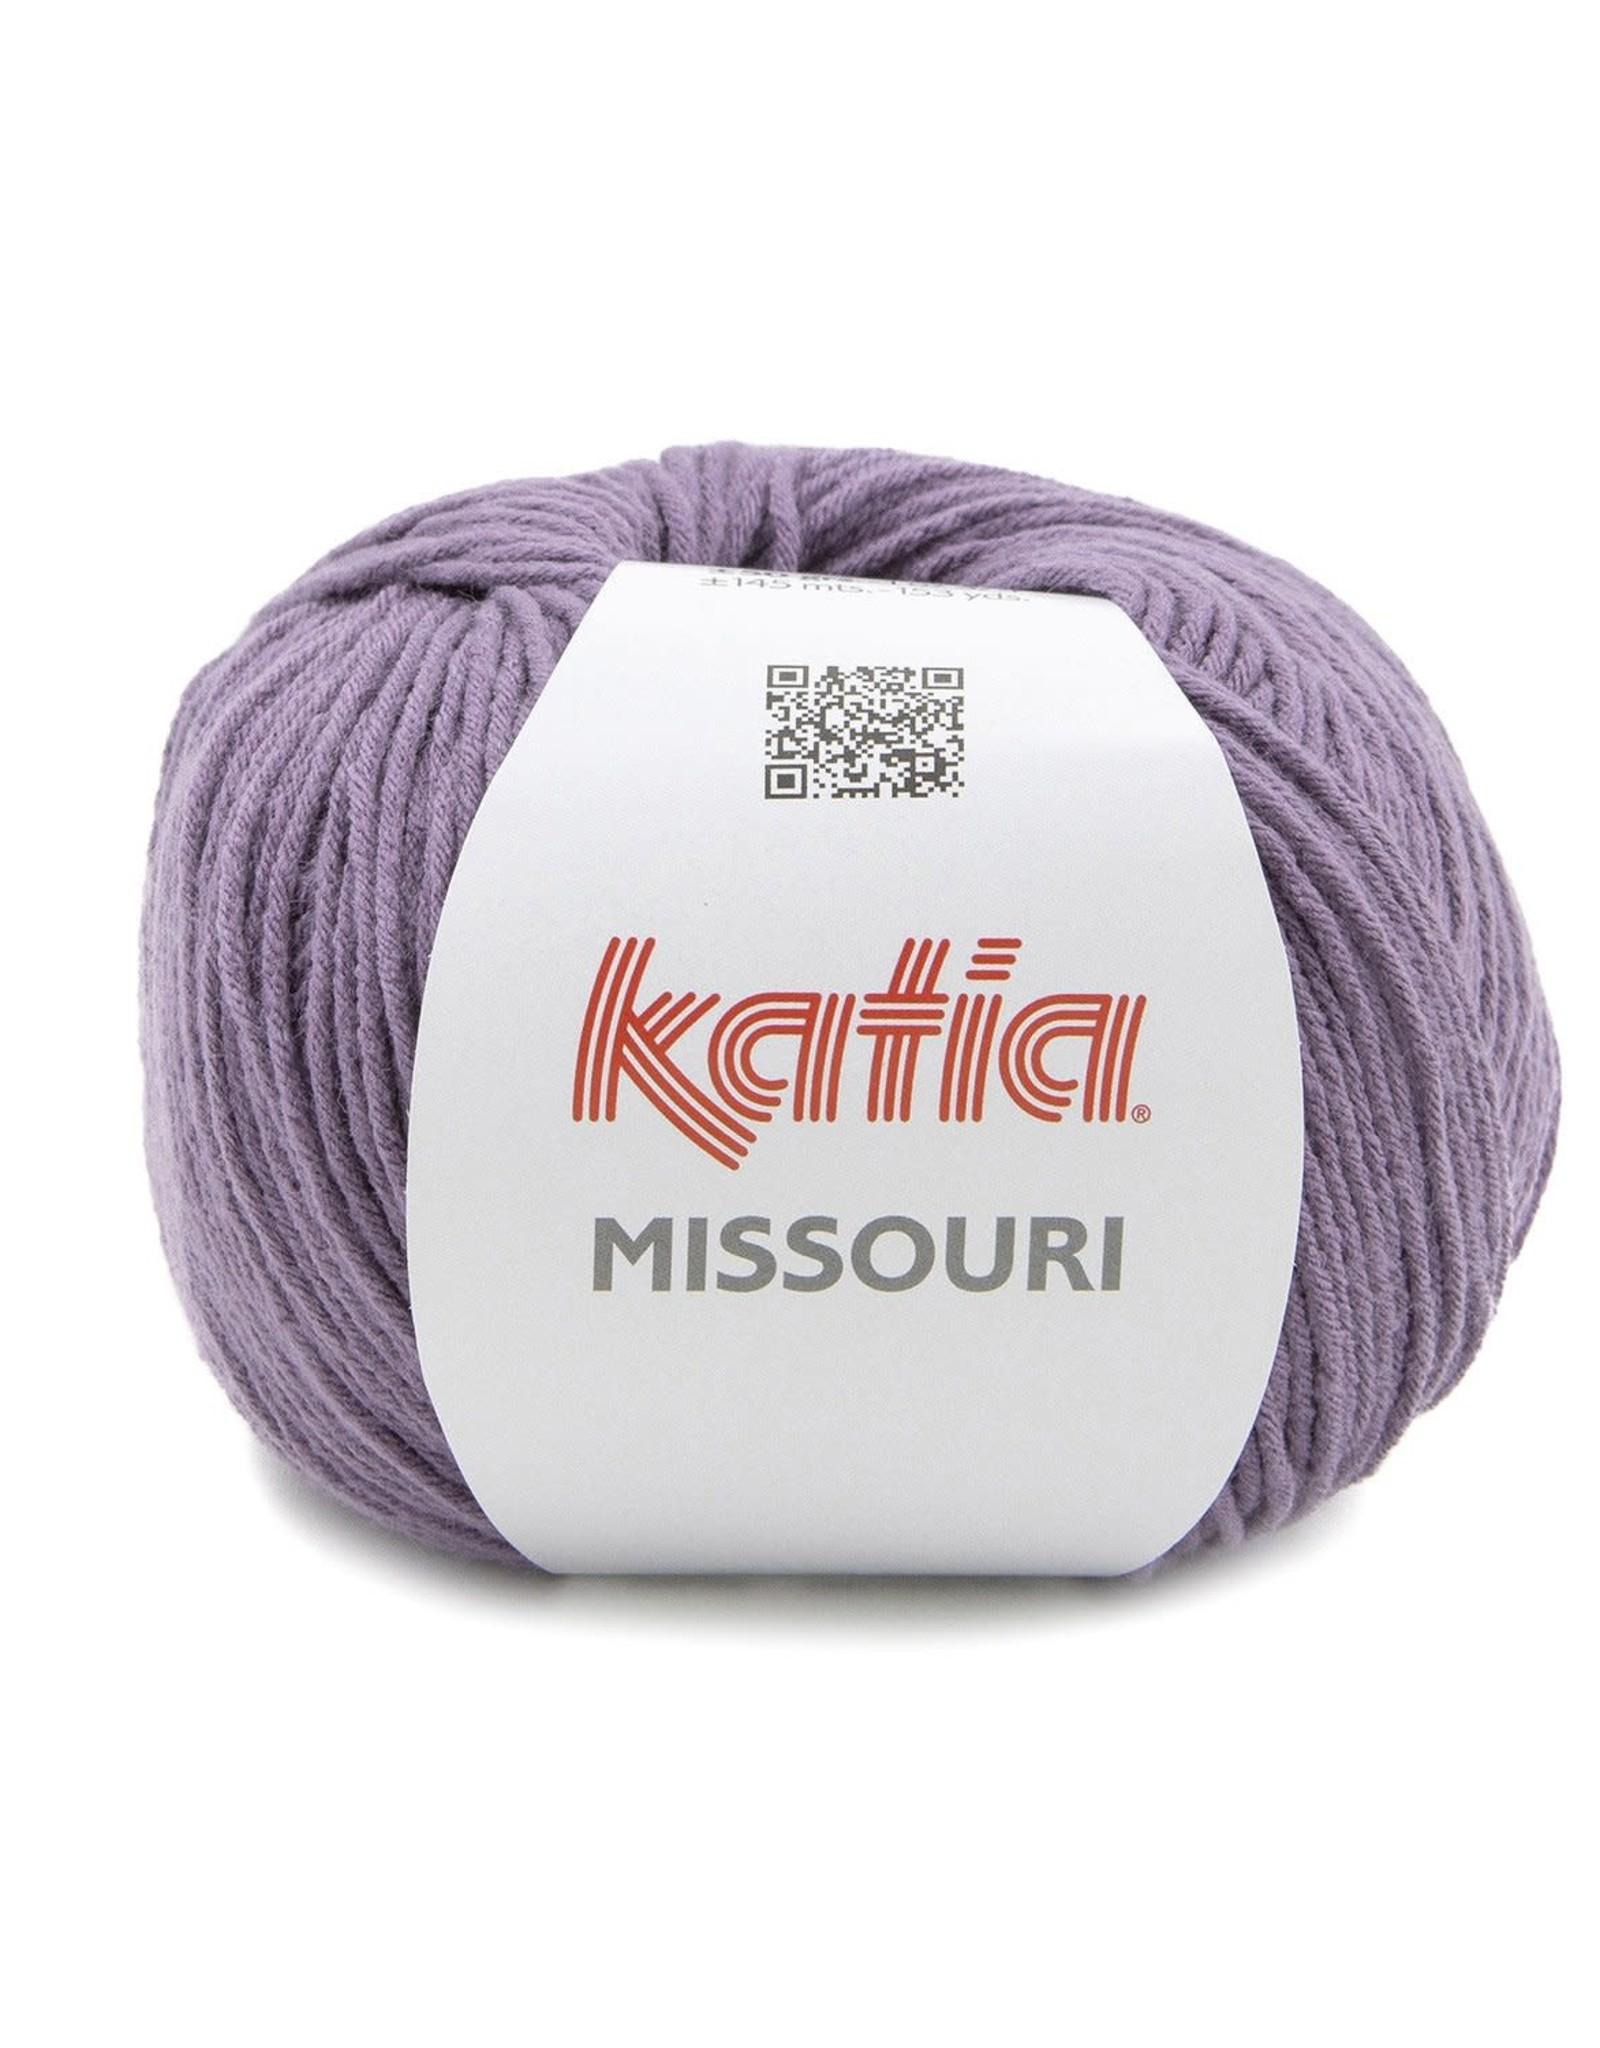 Katia Katia Missouri 46  donker paars